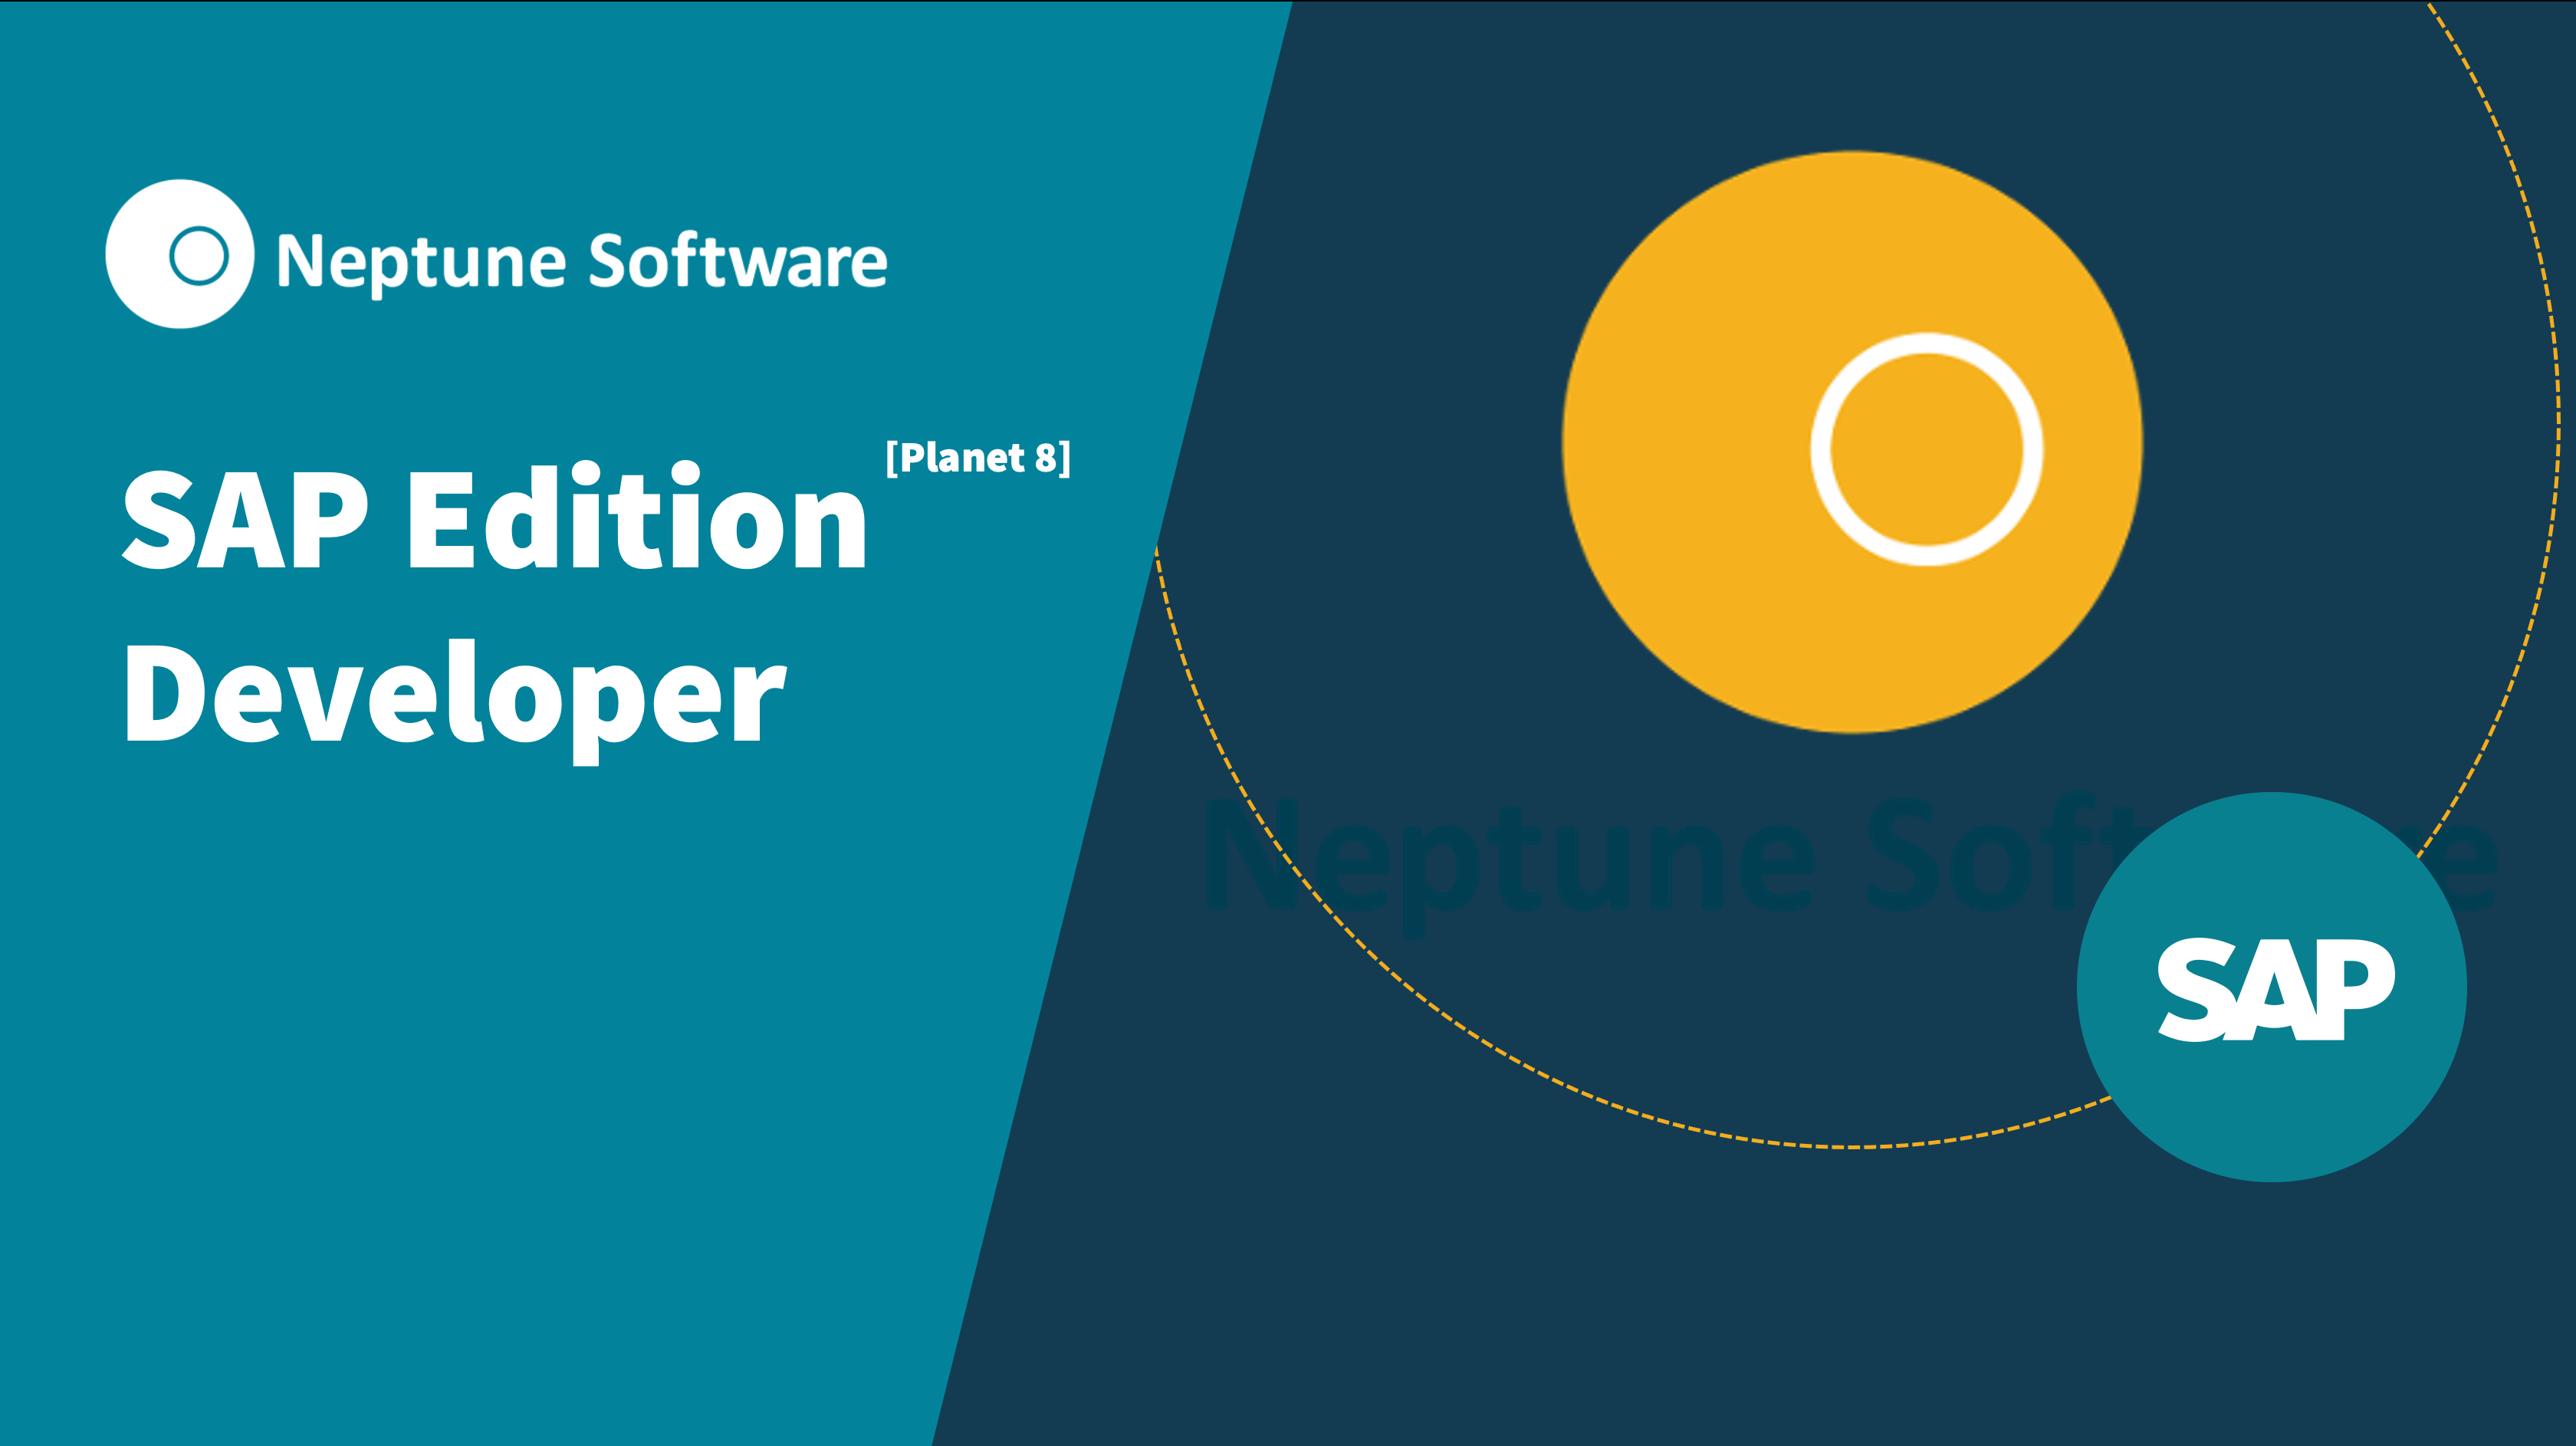 SAP Edition [Planet 8] - Developer Basic Level